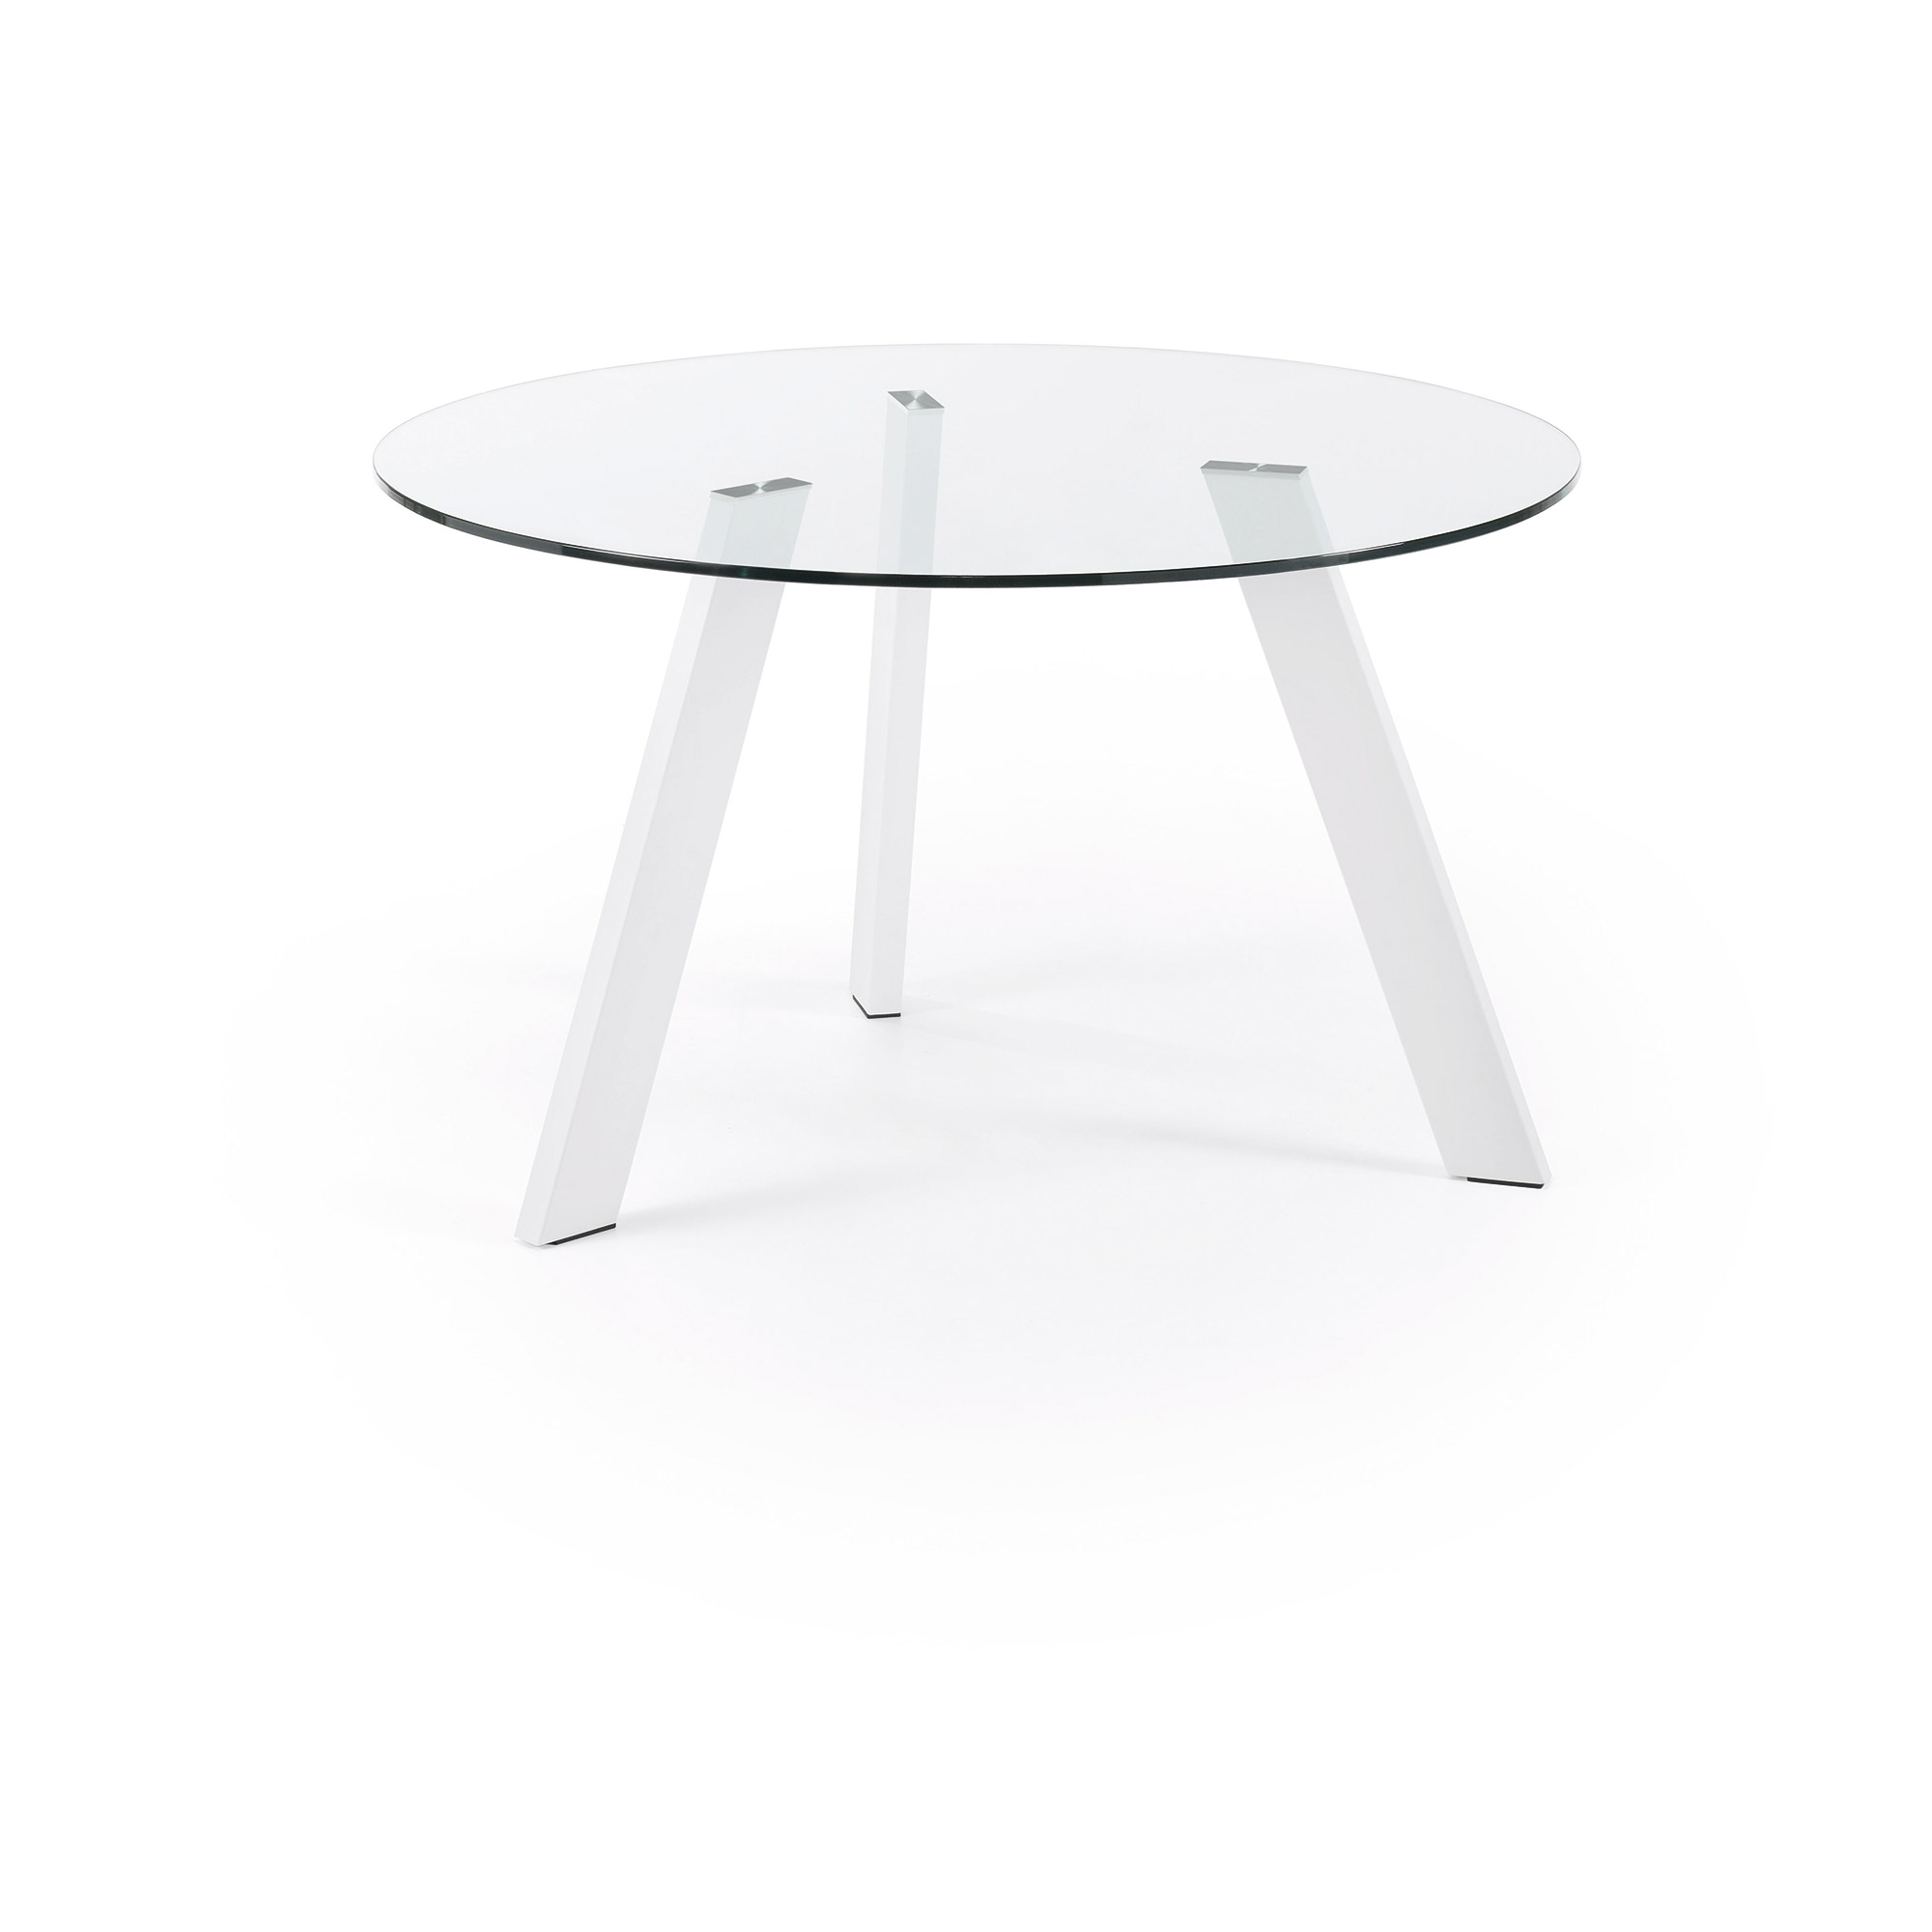 Kave home - table carib Ø 130 cm verre pieds...